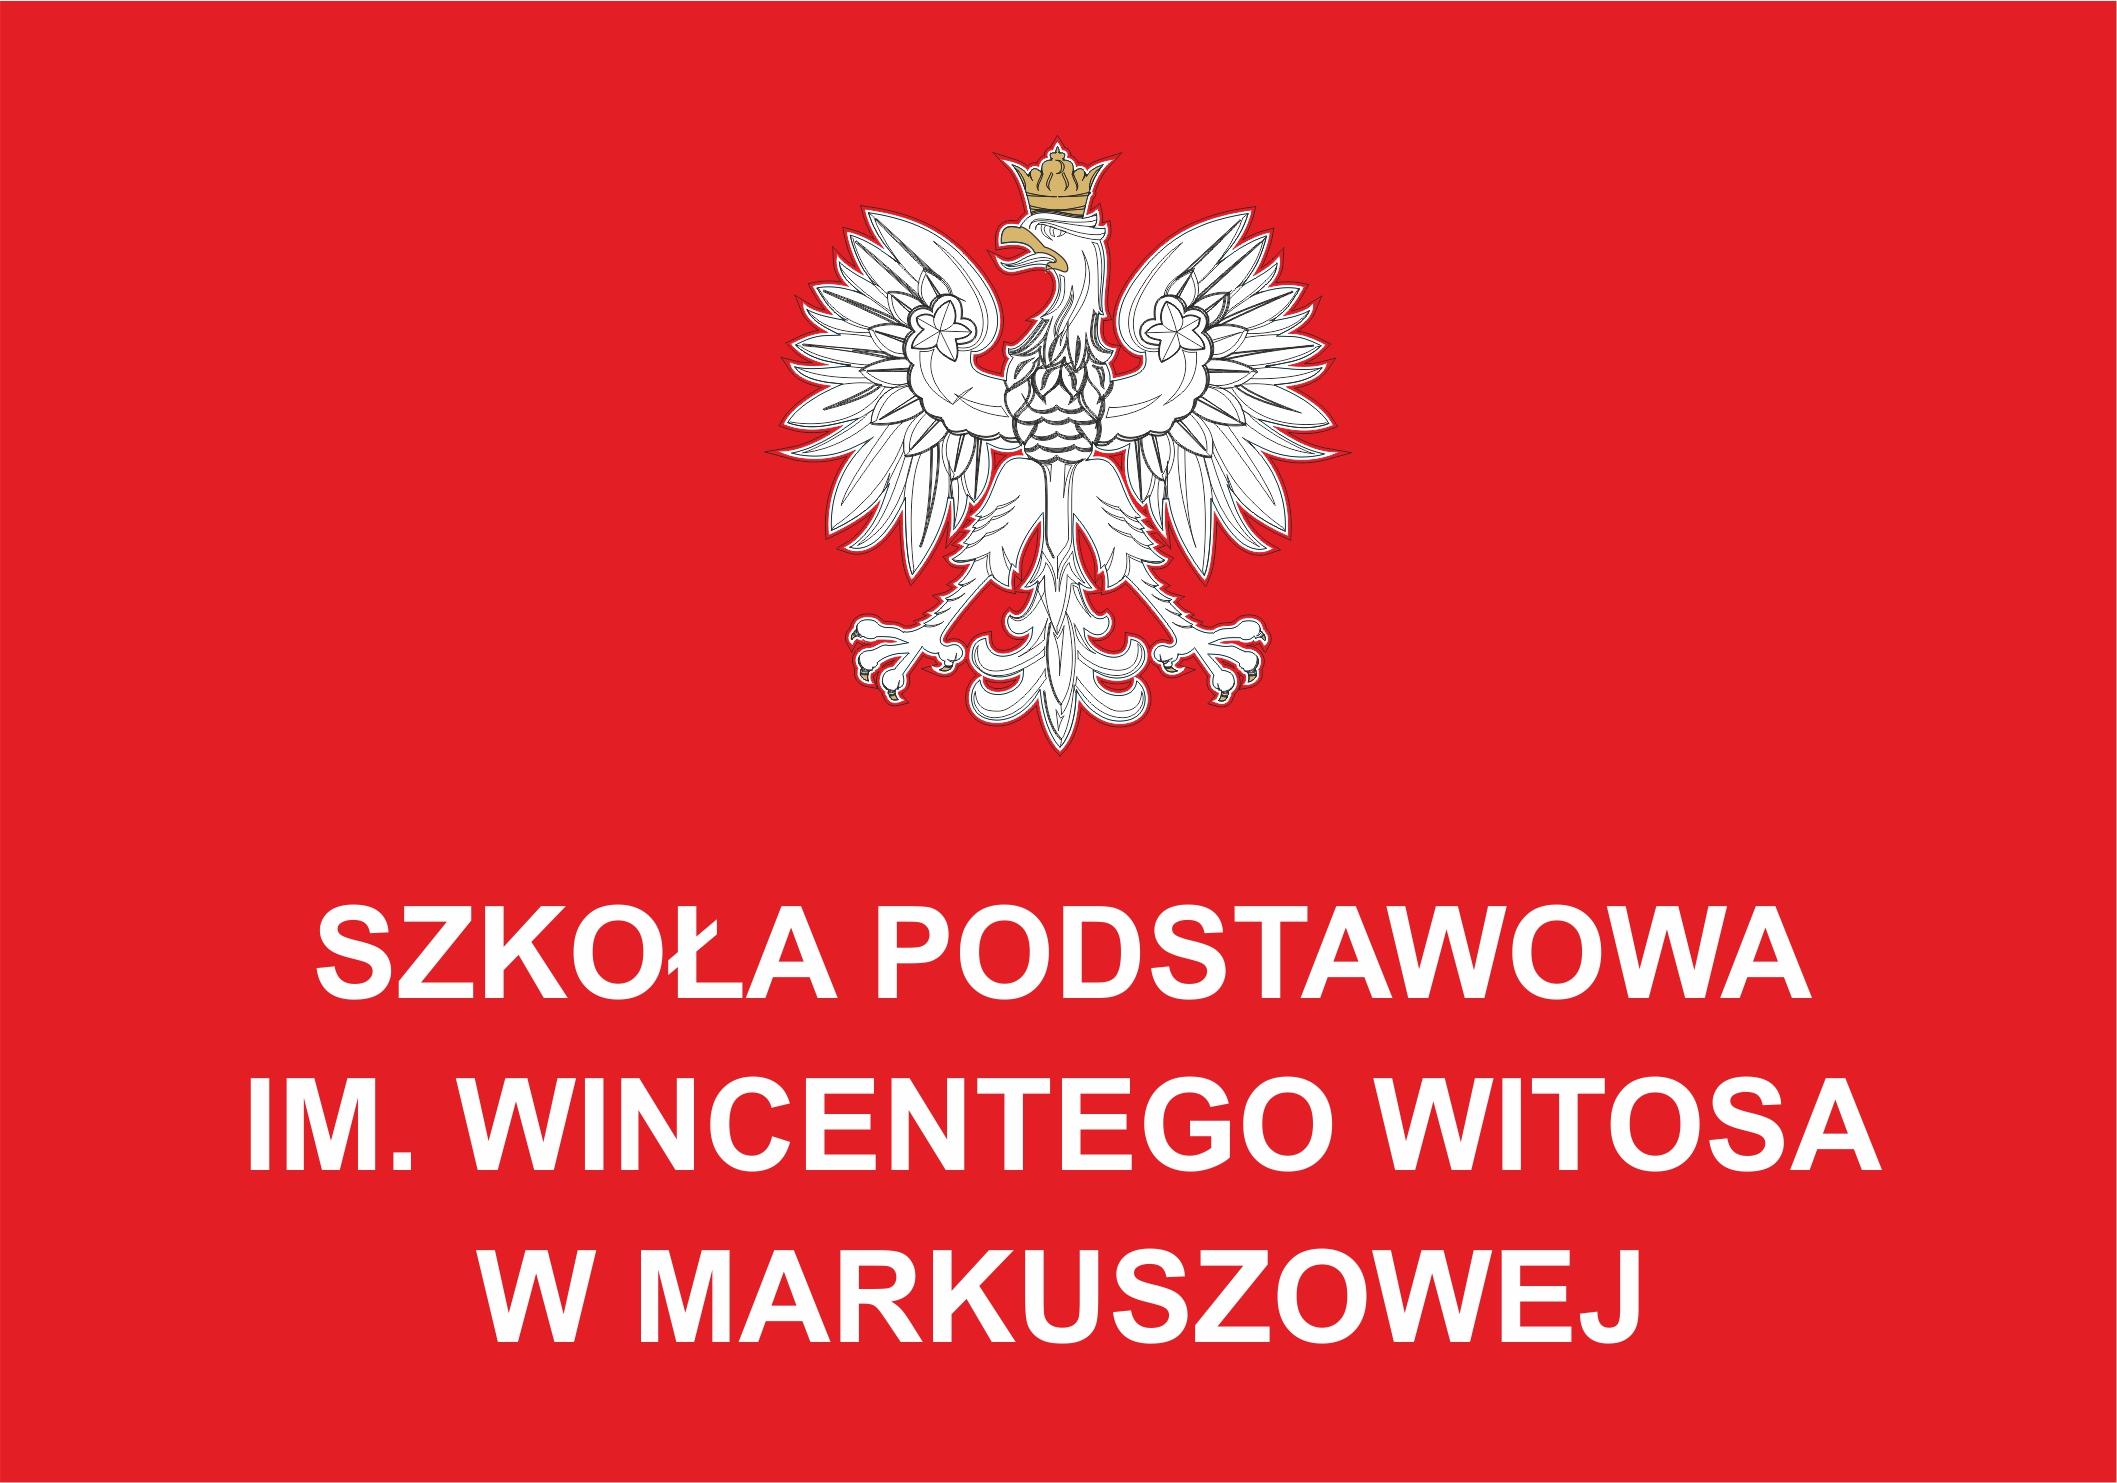 http://www.spm.szkolnastrona.pl/container/tablica_godlo1.jpg